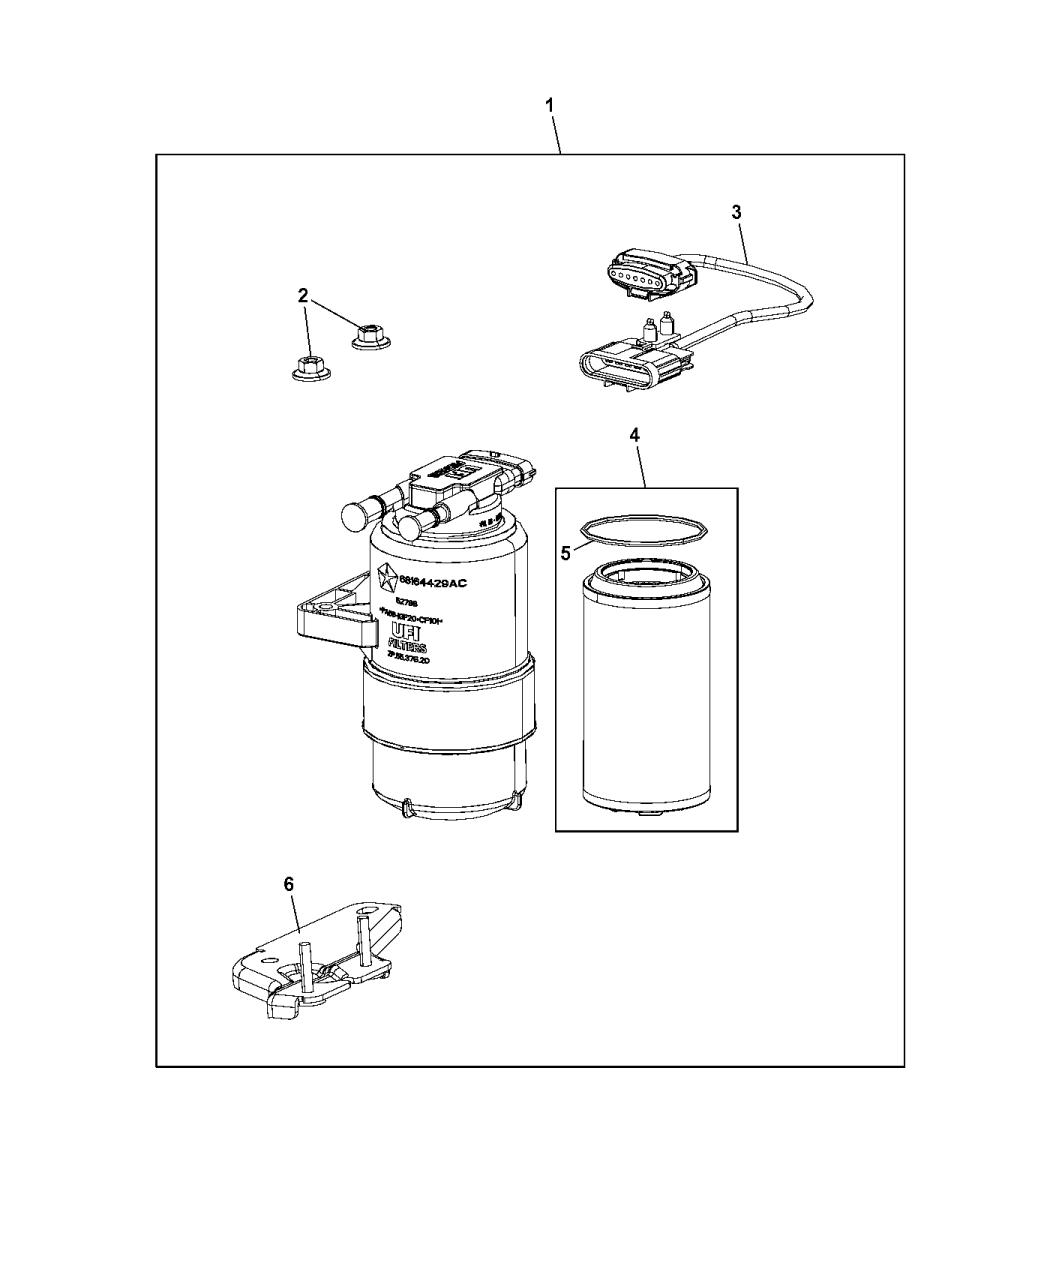 2014 Ram 1500 Fuel Filter Amp Water Separator Mopar Parts